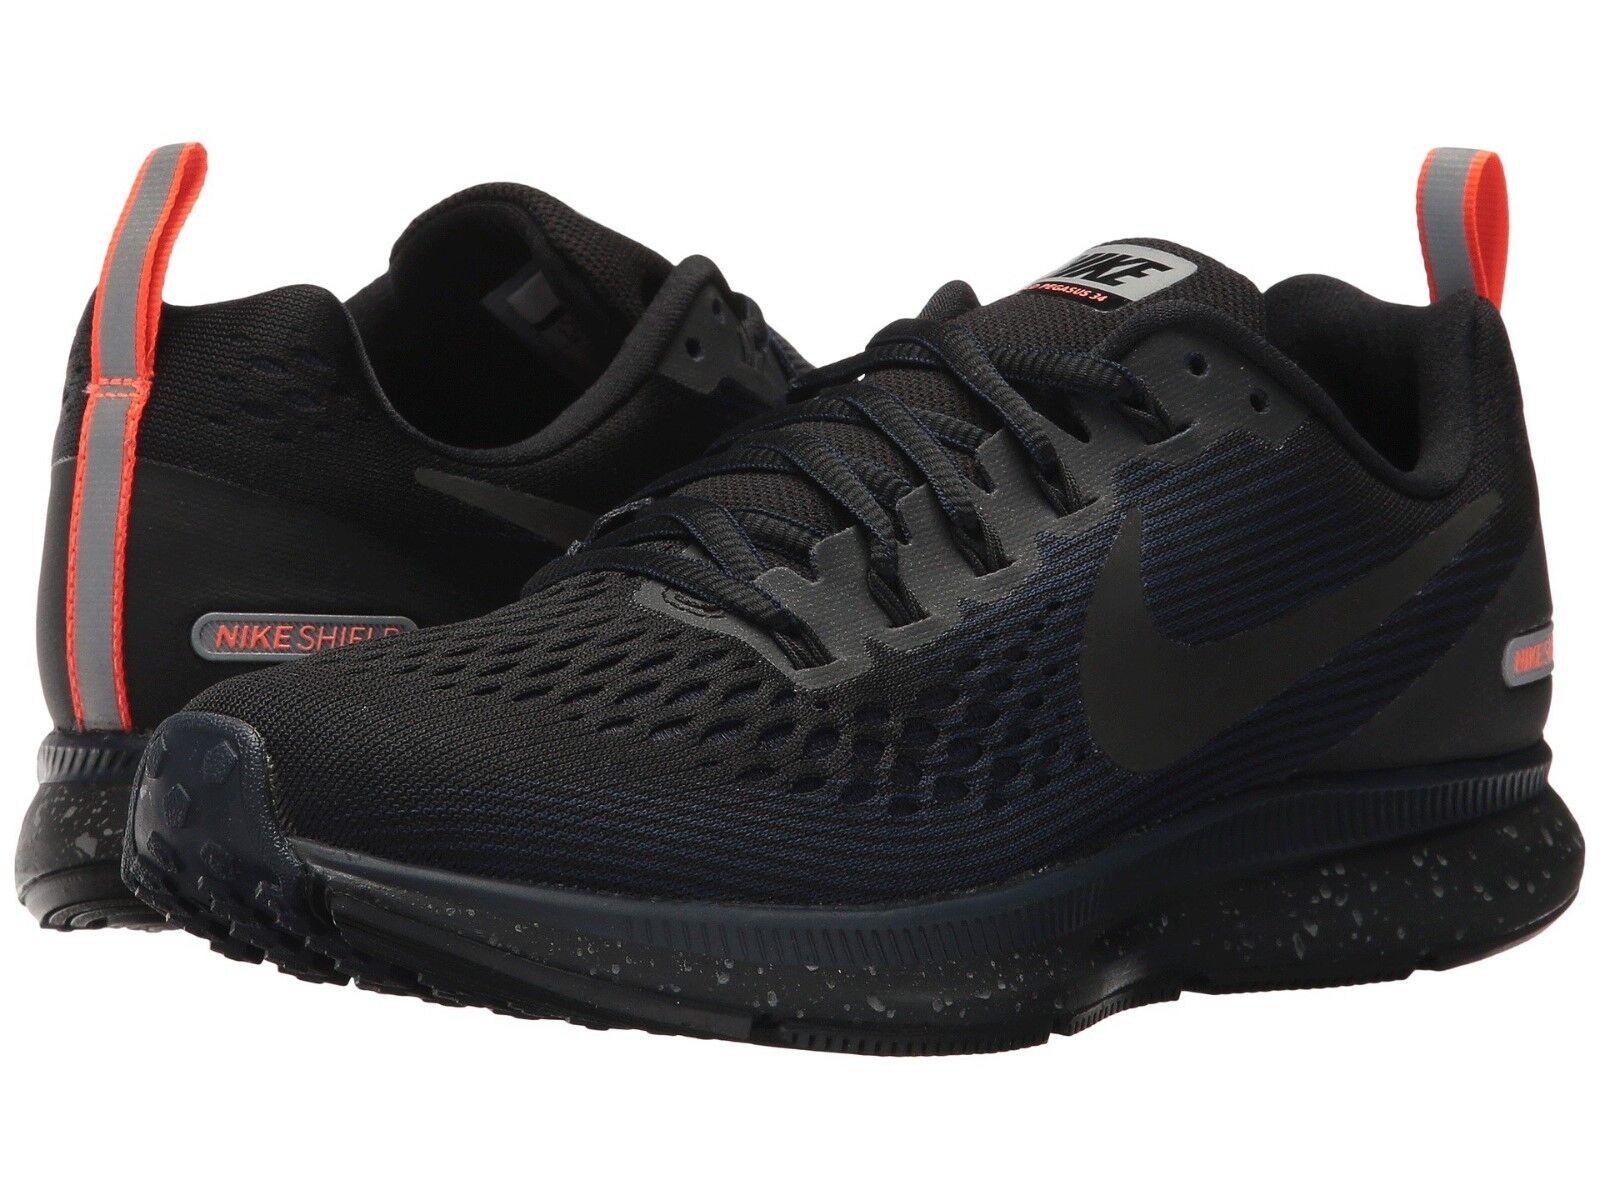 Nike Air Zoom Pegasus 34 Shield Women`s Szs 9-10.5 Black/Obsidian 907328-001 NEW